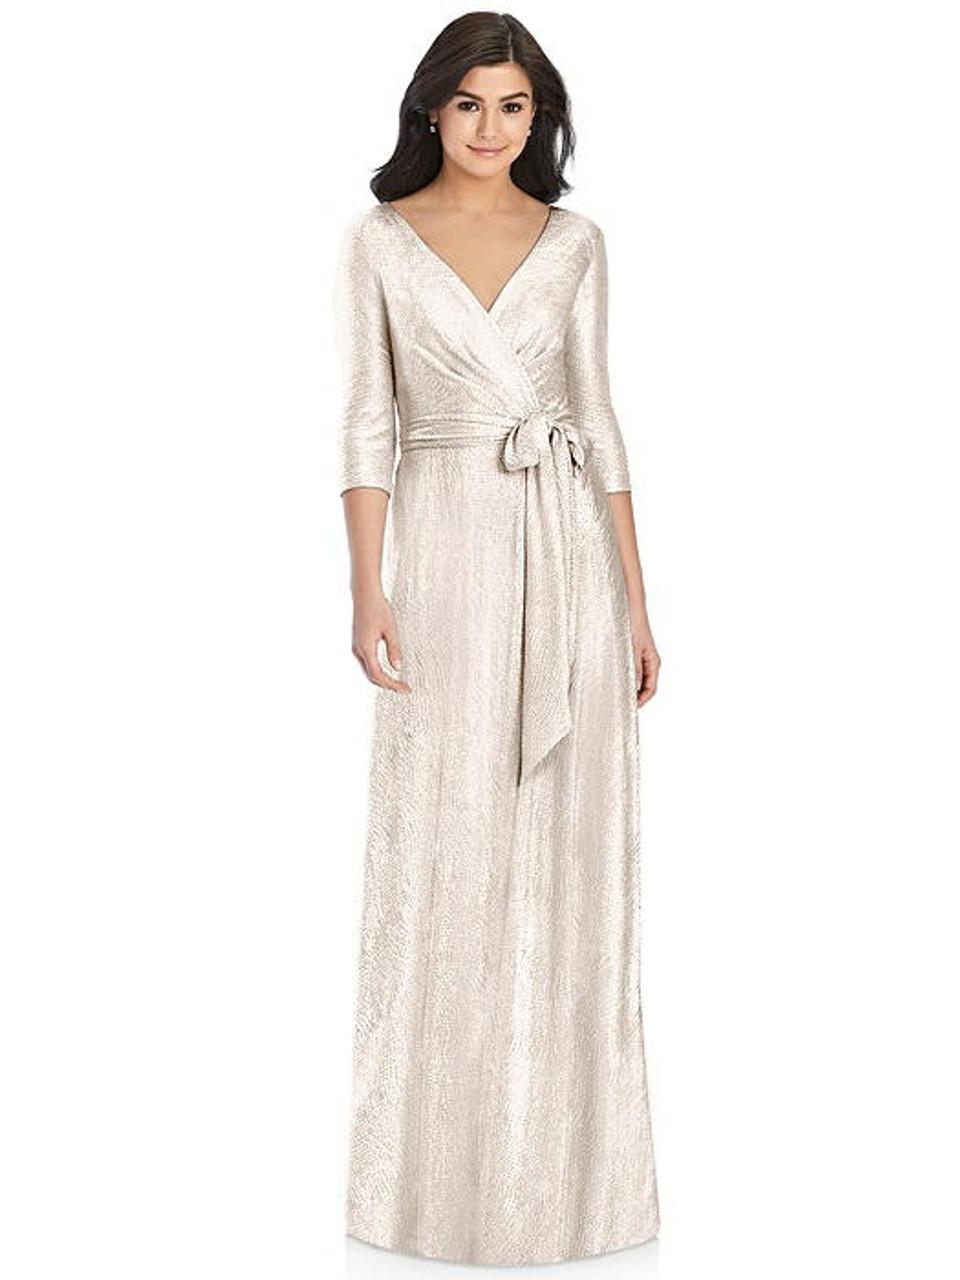 Rose Gold  - Dessy Collection Bridesmaid Dress 3028 - Soho Metallic